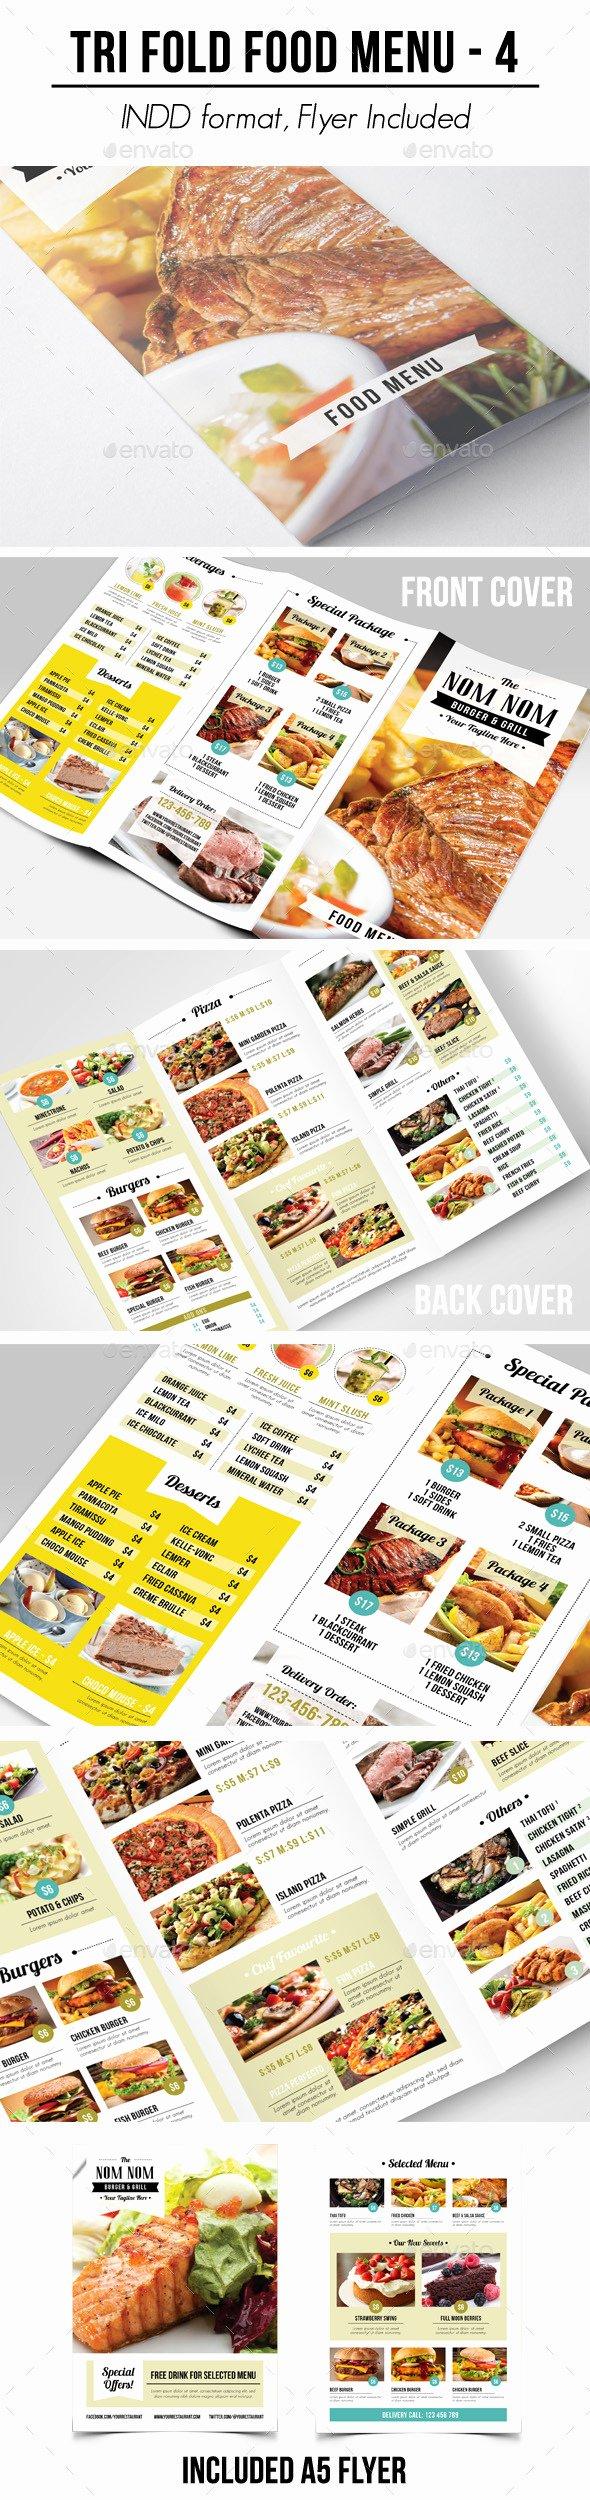 Tri Fold Food Menu 4 by Apriliapratama